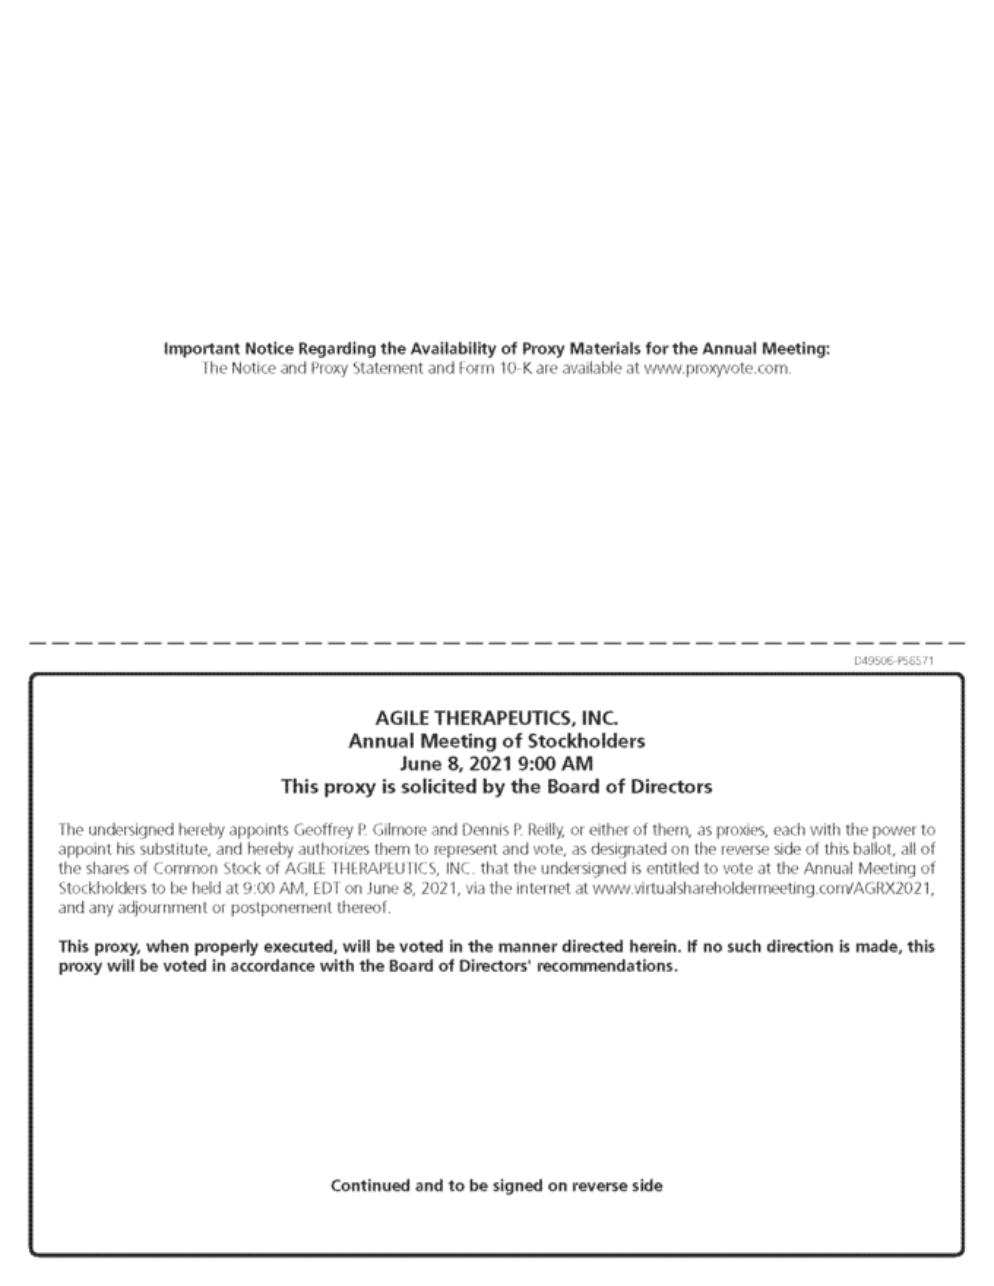 New Microsoft Word Document_agile therapeutics inc_gt20_vsmv_prxy_p56571_21(#55017) - final_page_2.gif